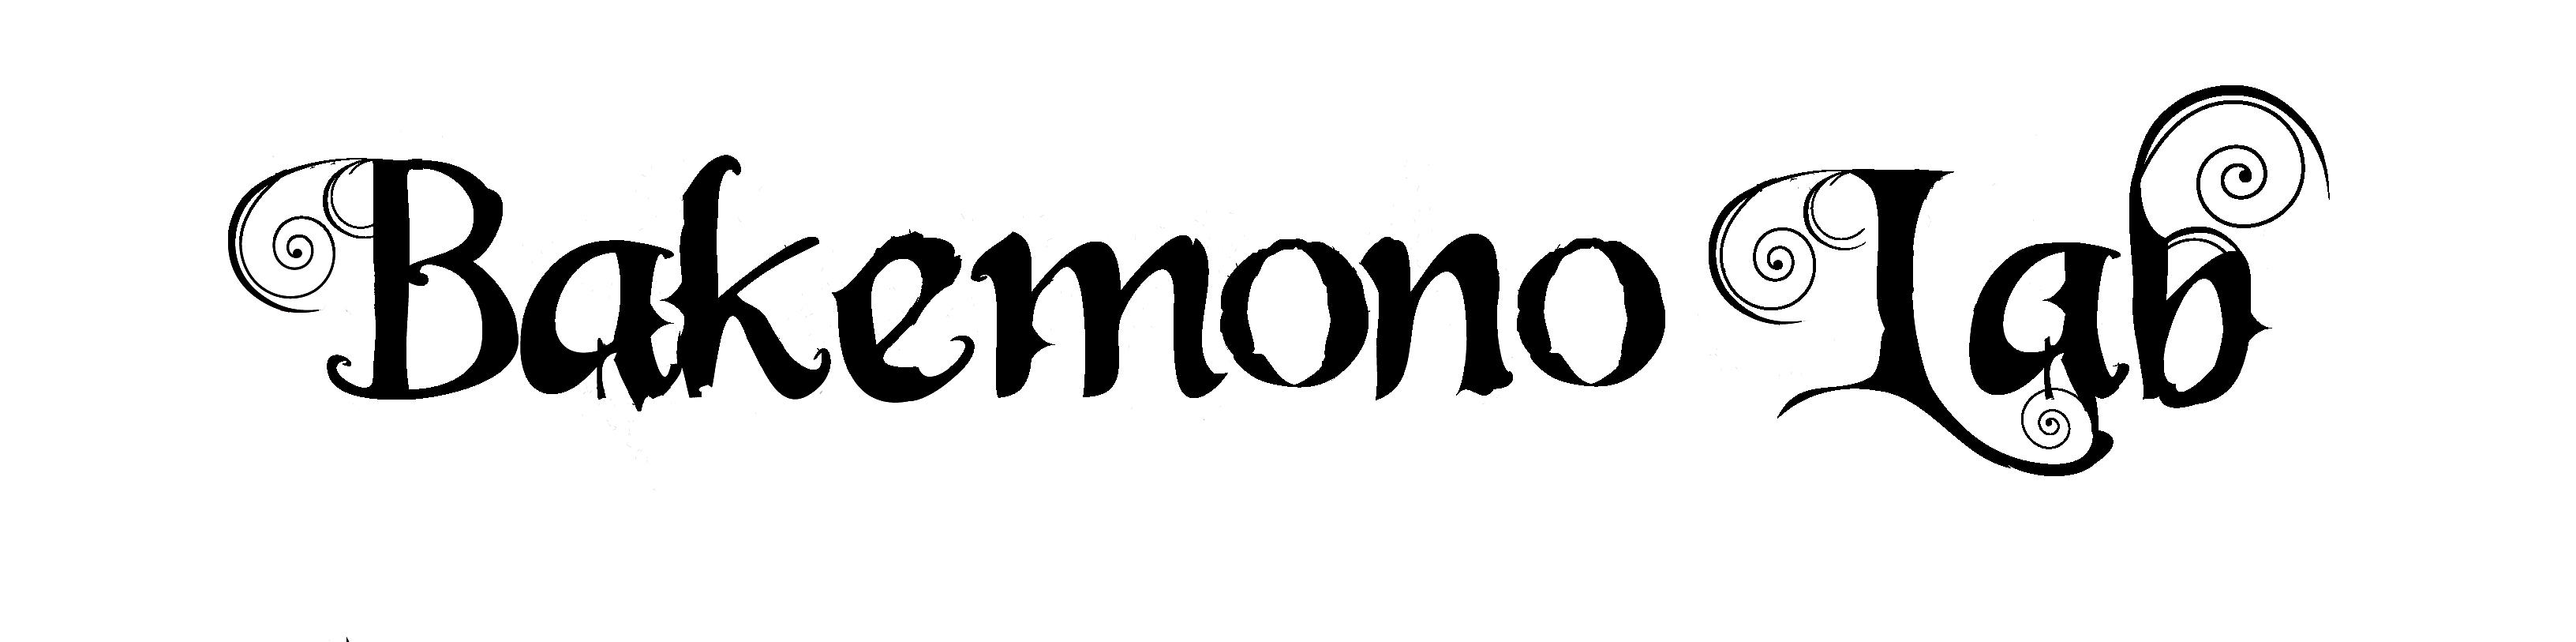 Bakemono Lab - Casa editrice